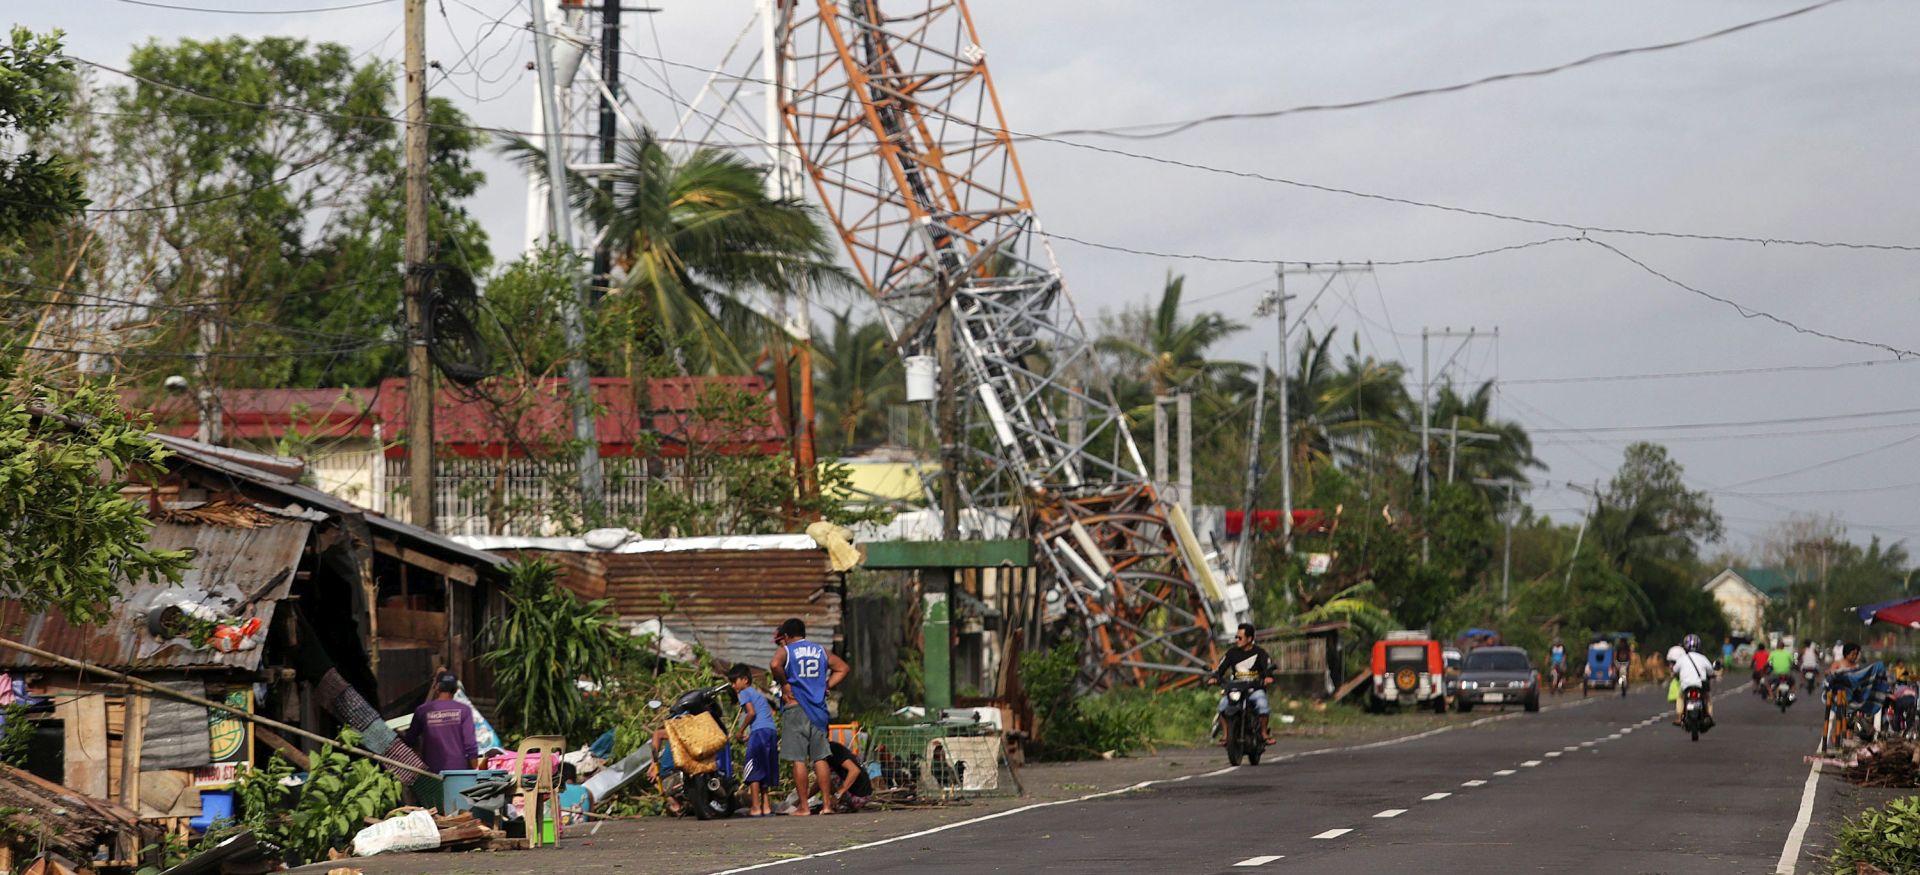 Snažan potres u blizini Filipina, rizik od opasnih valova